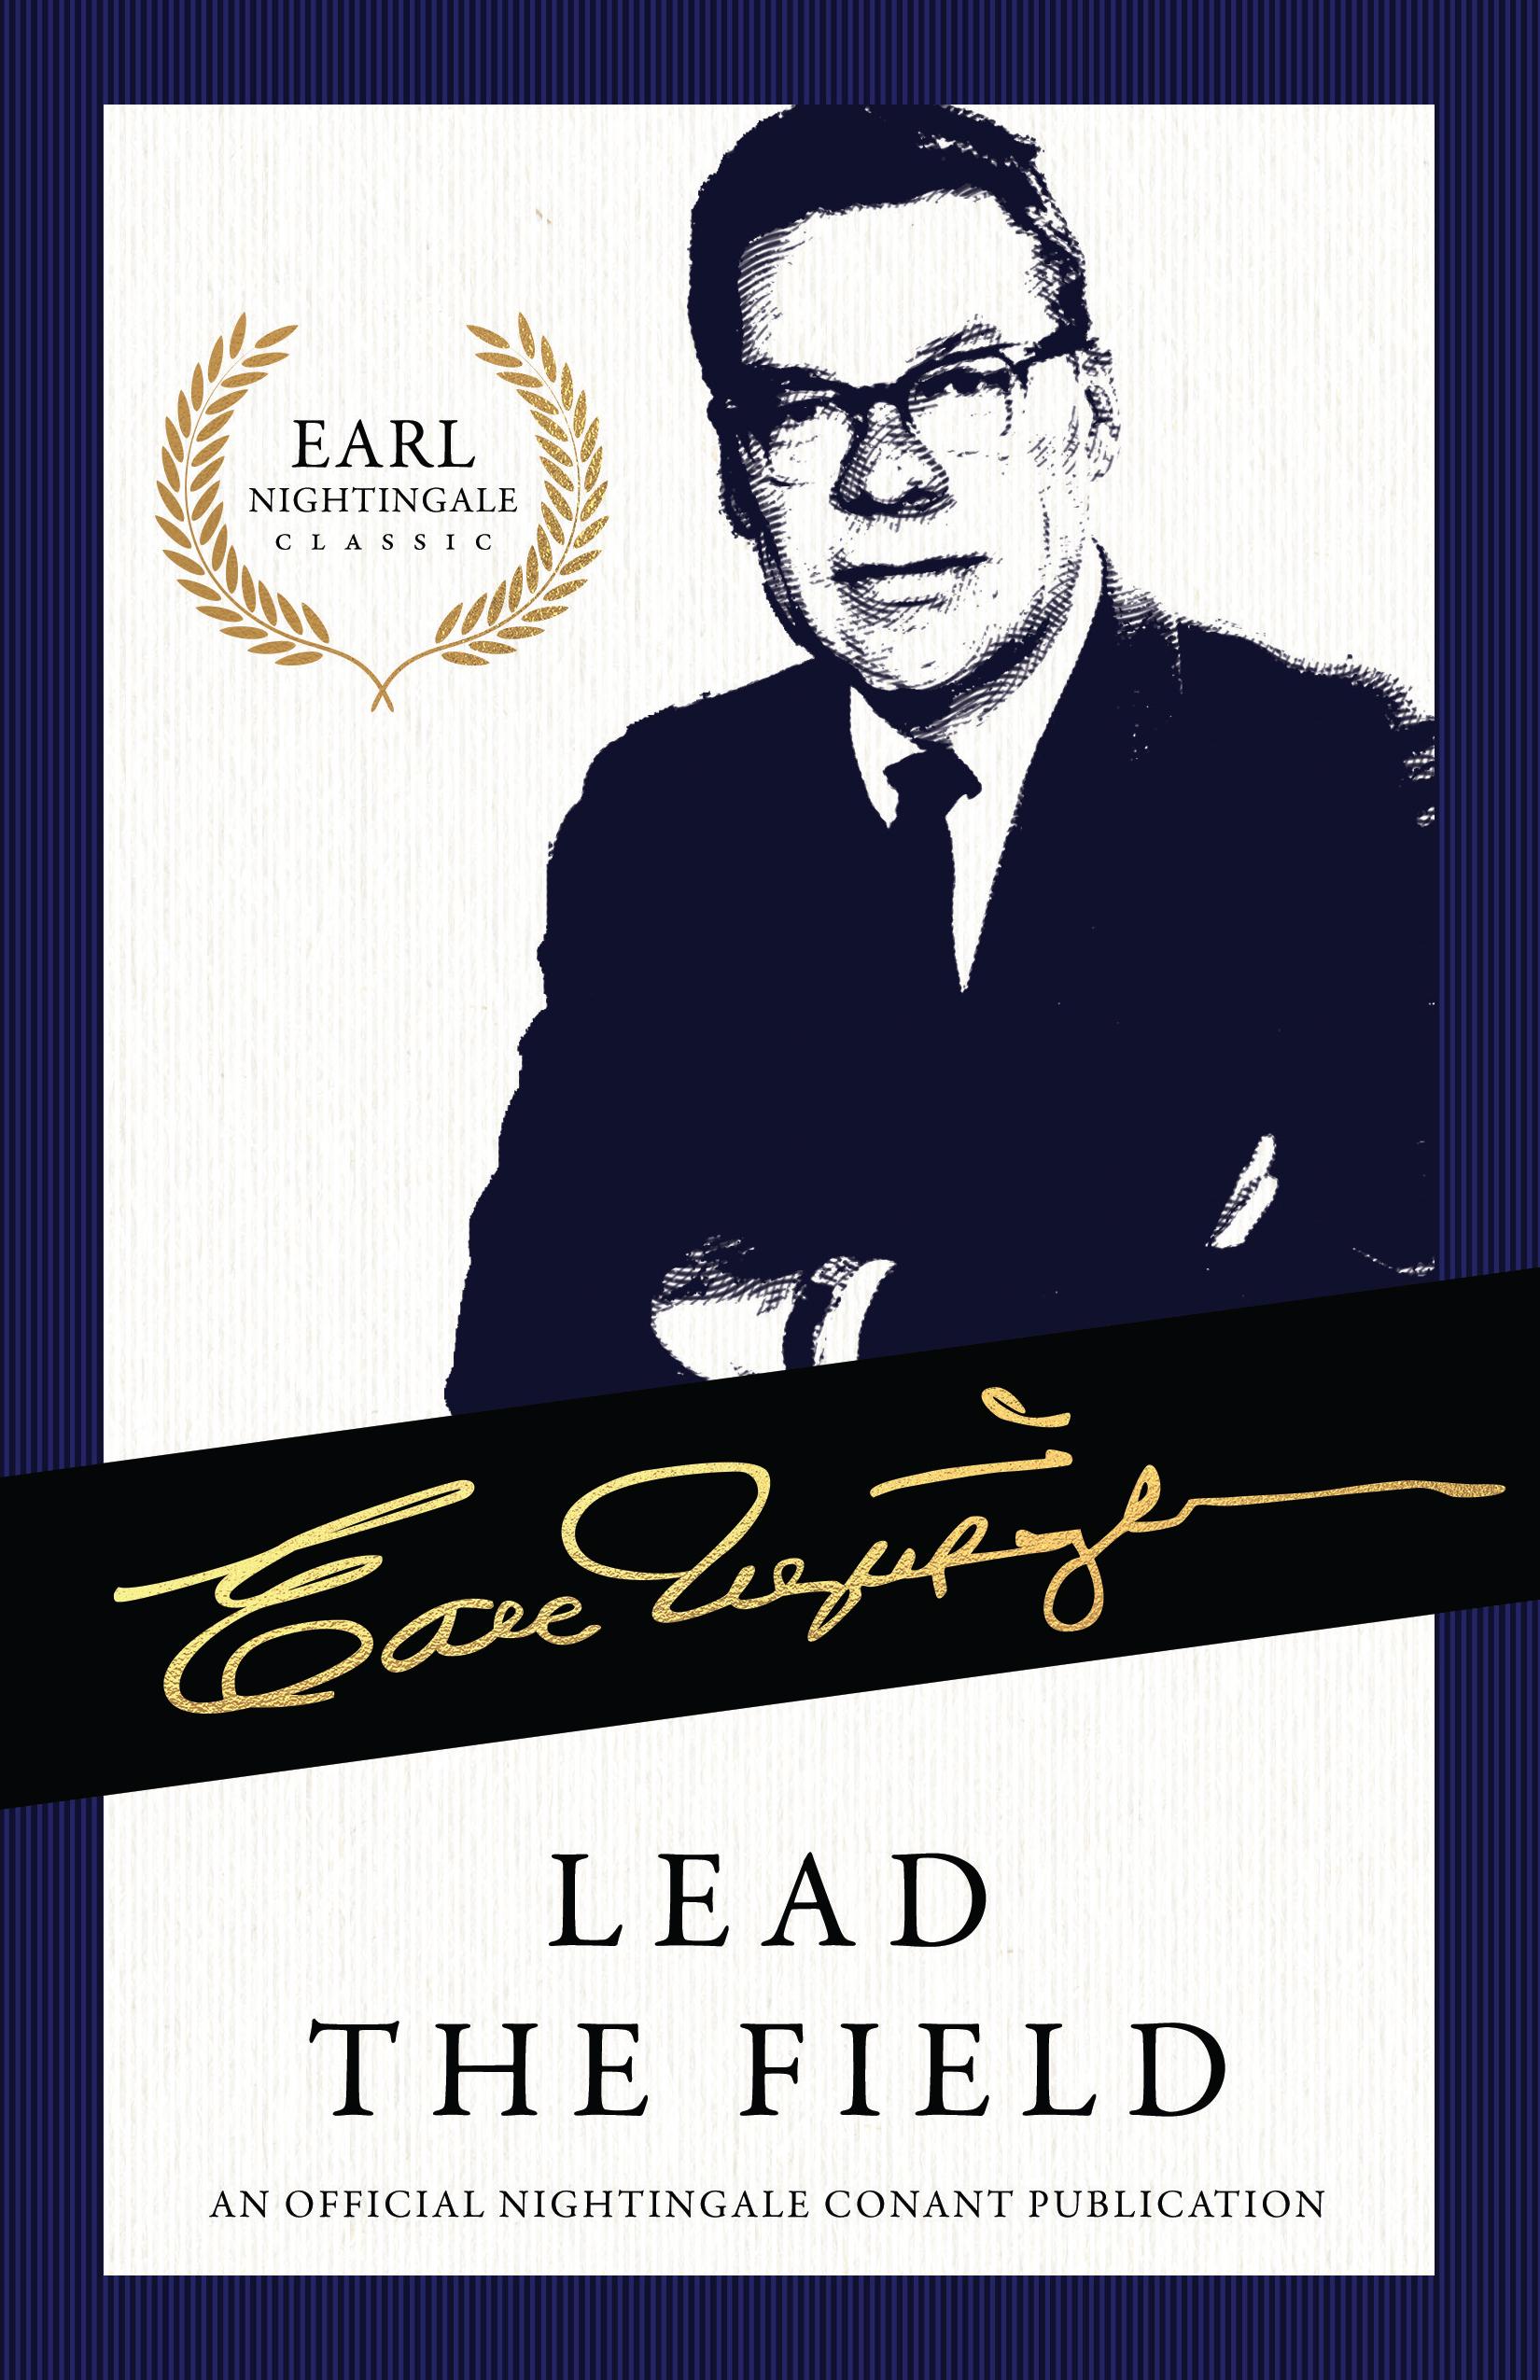 Lead the Field - By earl nightingale